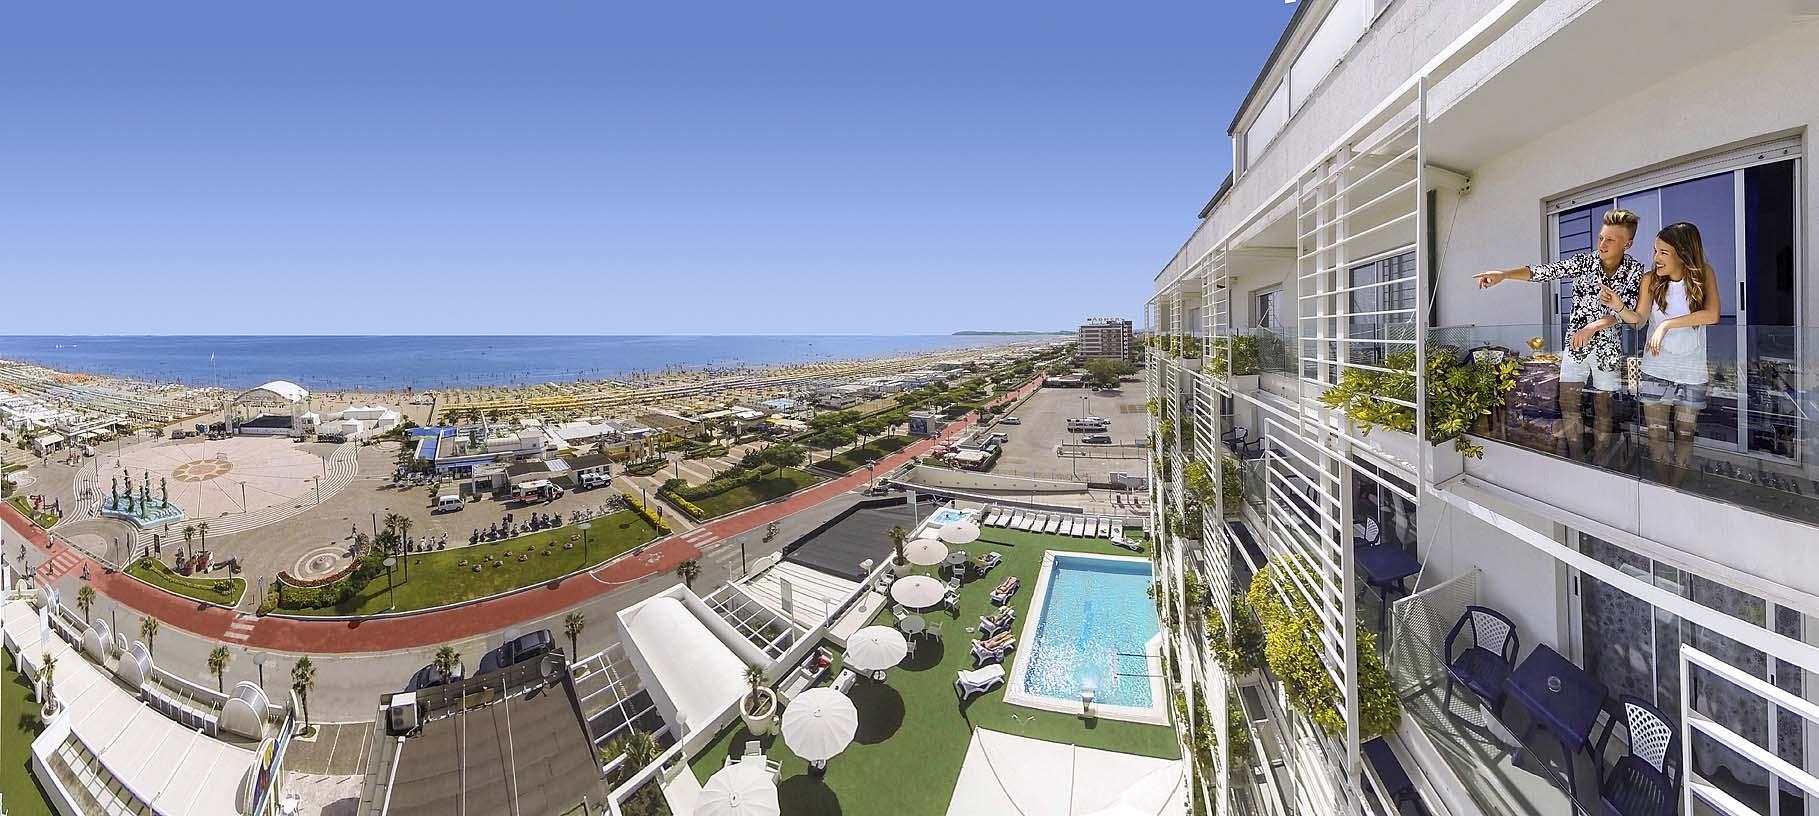 Rimini Hotel Mediterraneo